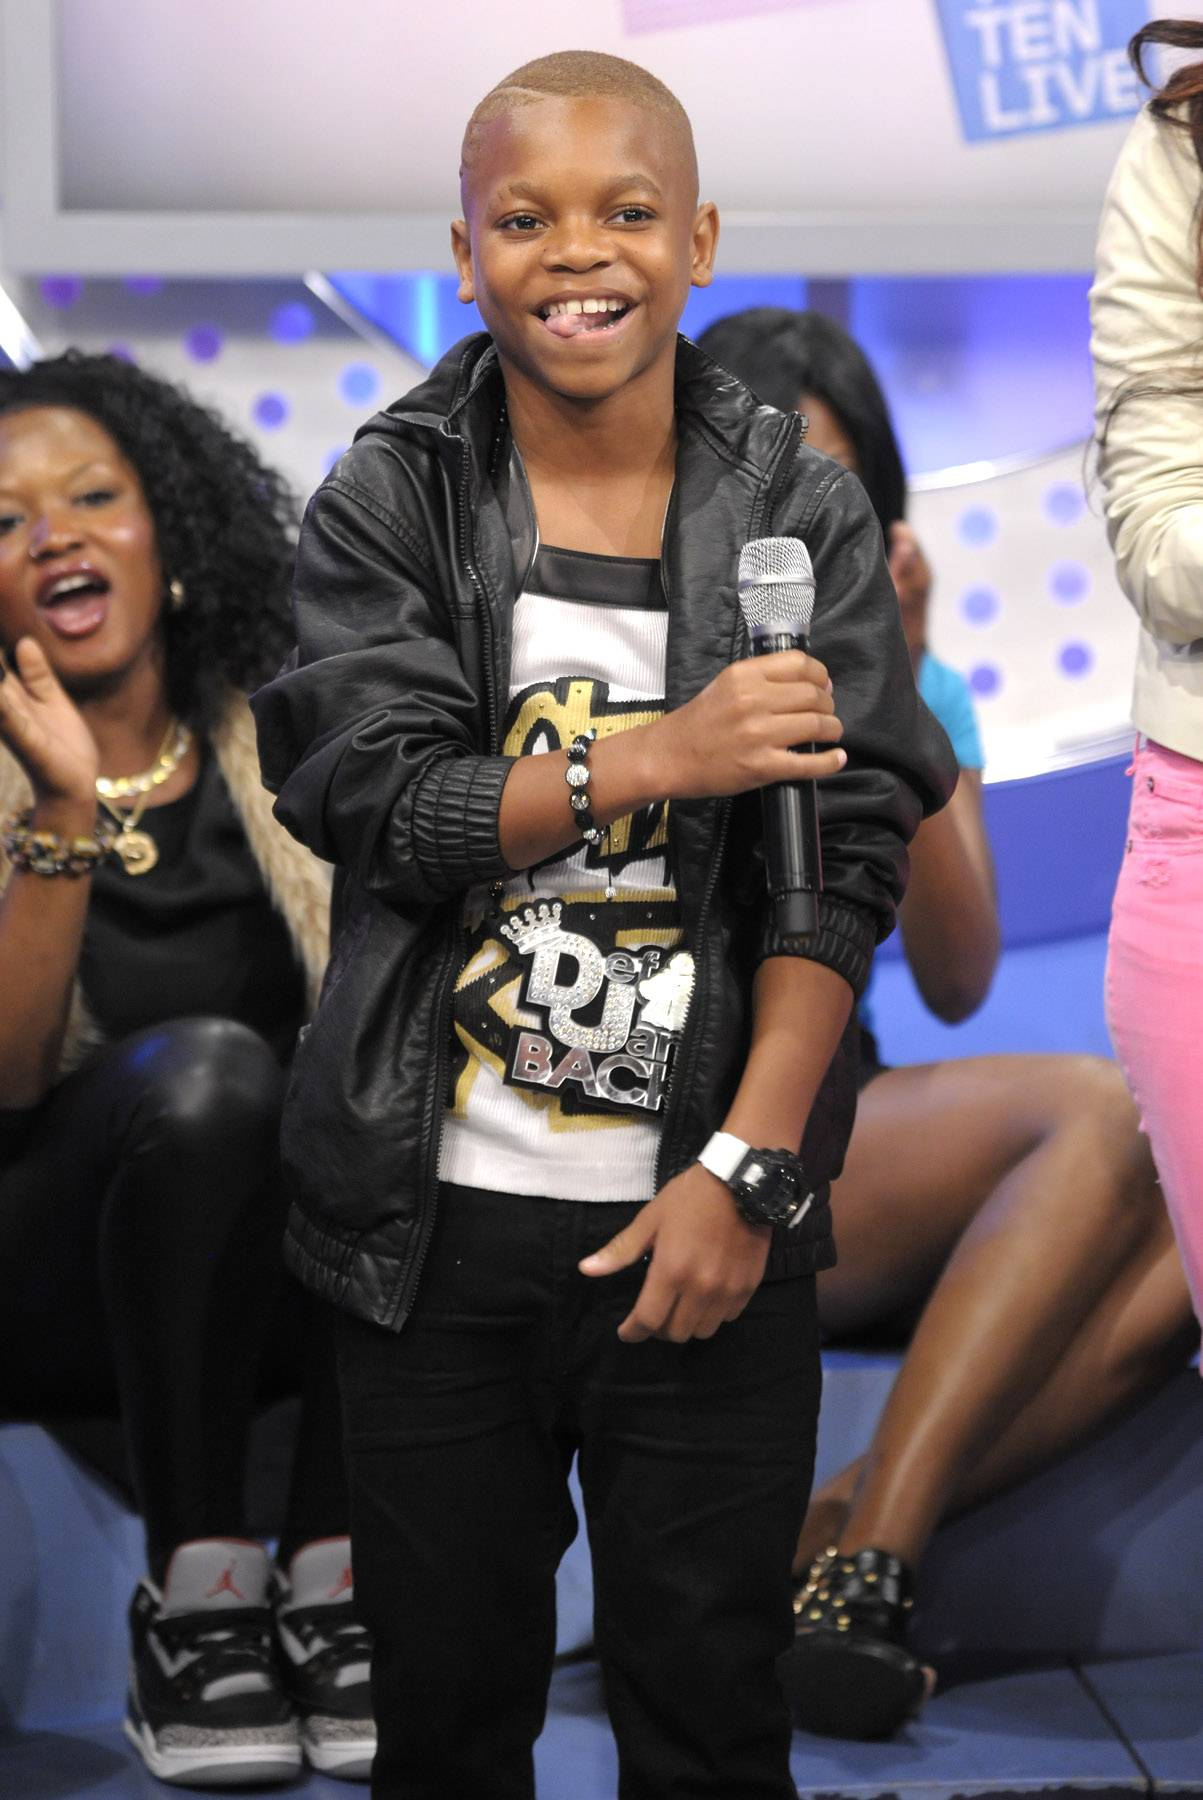 Lil niqo smiling. - Lil Niqo at 106 & Park, May 16, 2012. (Photo: John Ricard / BET)